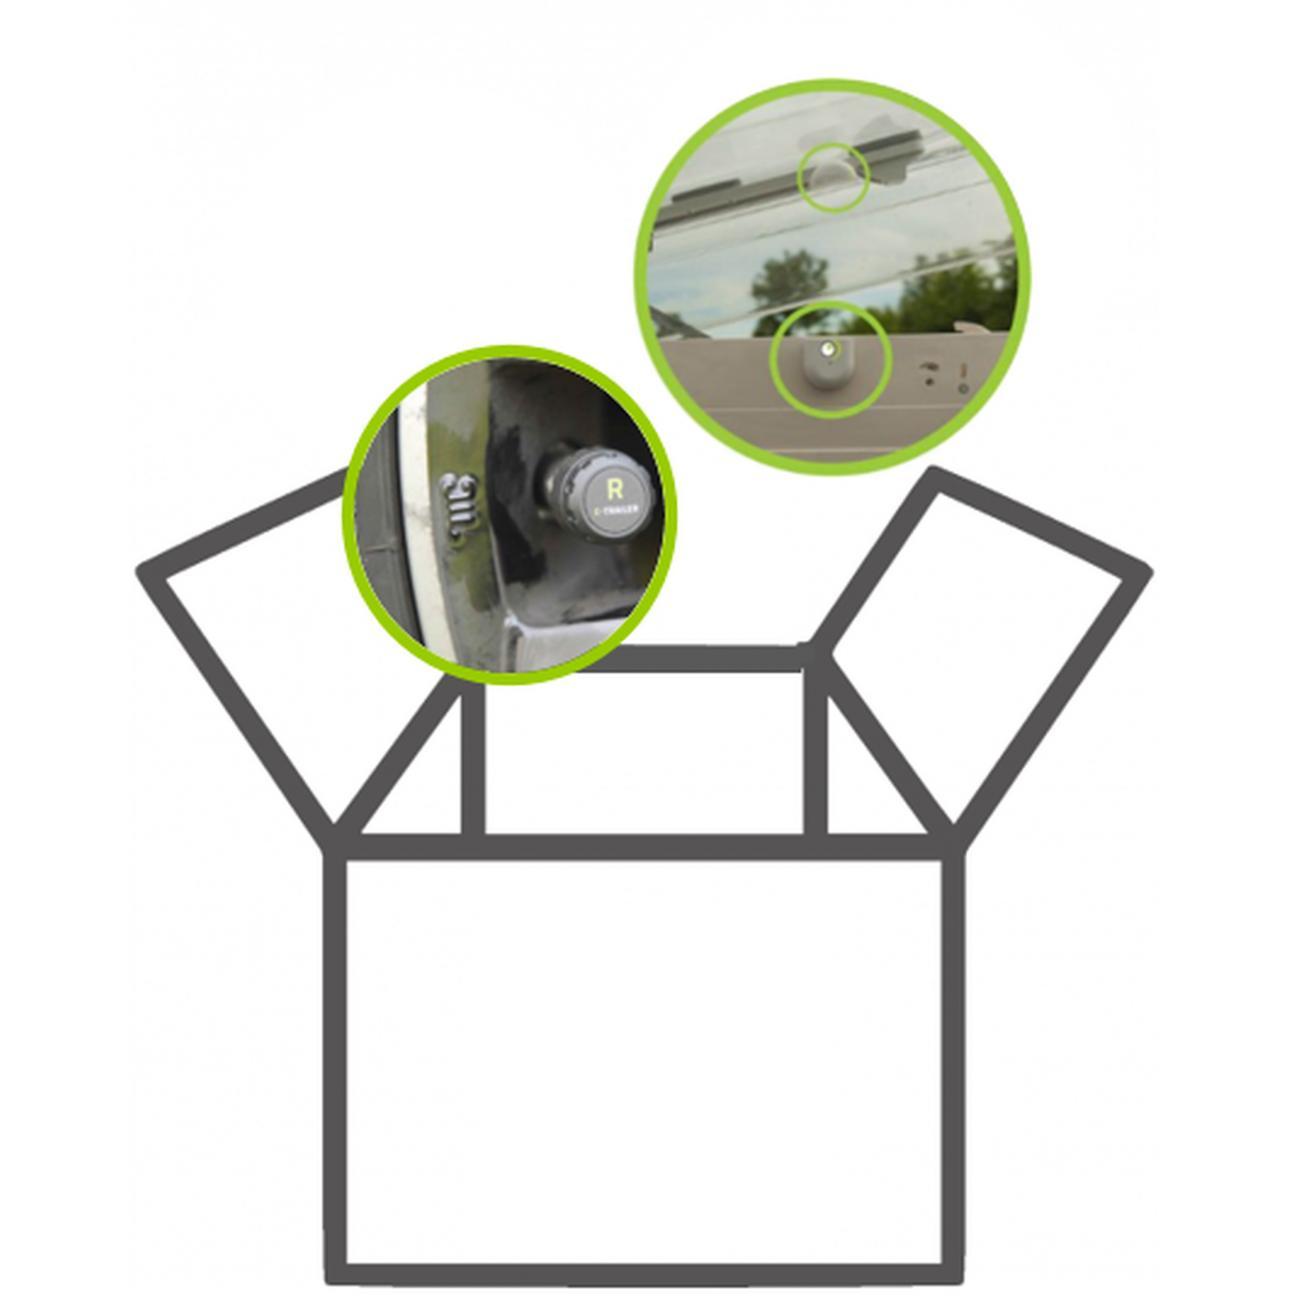 E-Trailer Safety Camper (2x Pressure-Switch)